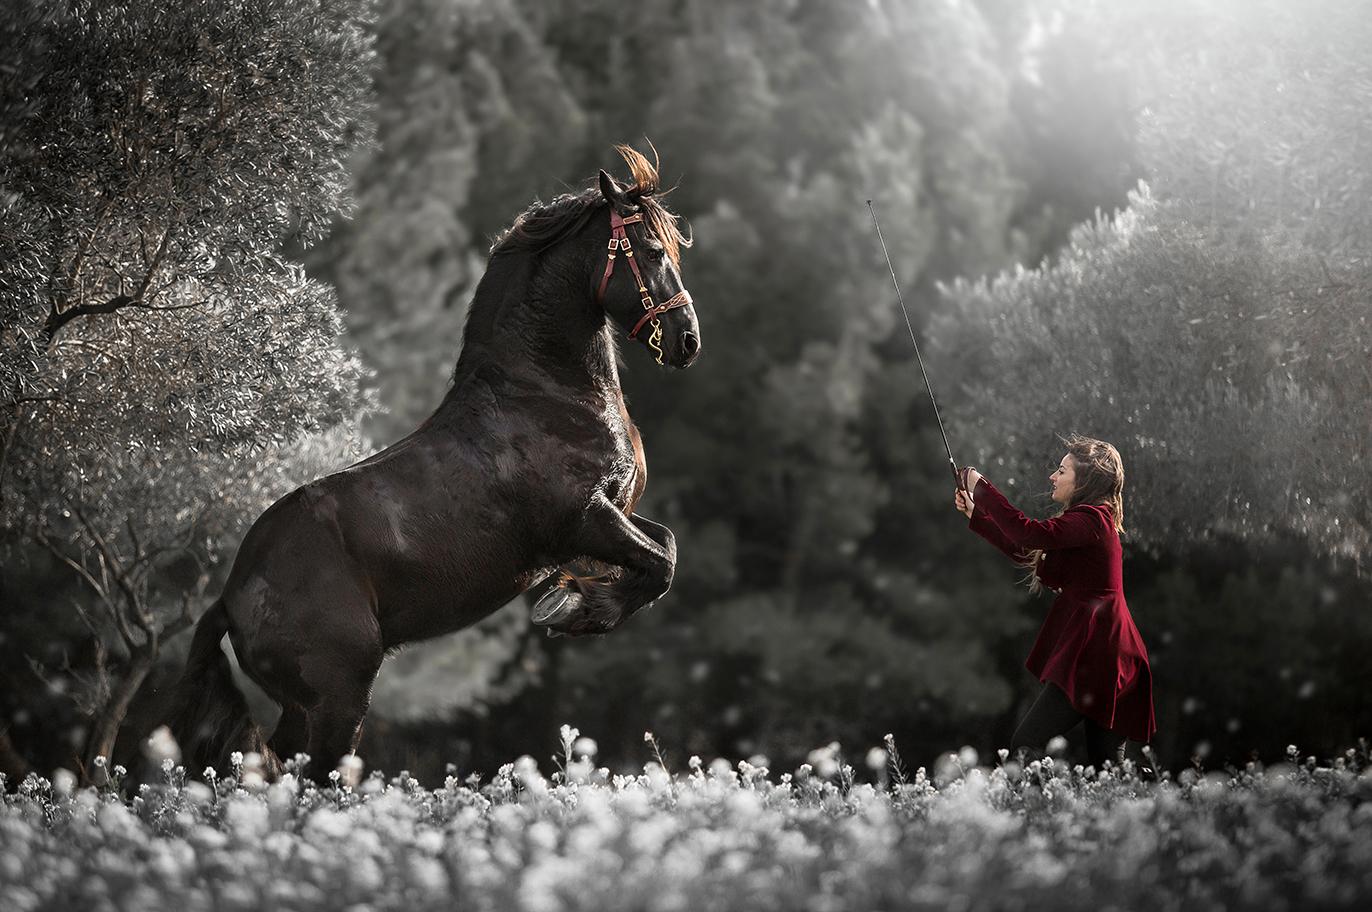 SNIMG_0470-sophie-narses-photographe-annecy-haute-savoie-book-shooting-portrait-geneve-cheval-suisse-cavalier-animaux-tirages-art-equestre-photo-modele-artiste-rhone-alpes-france